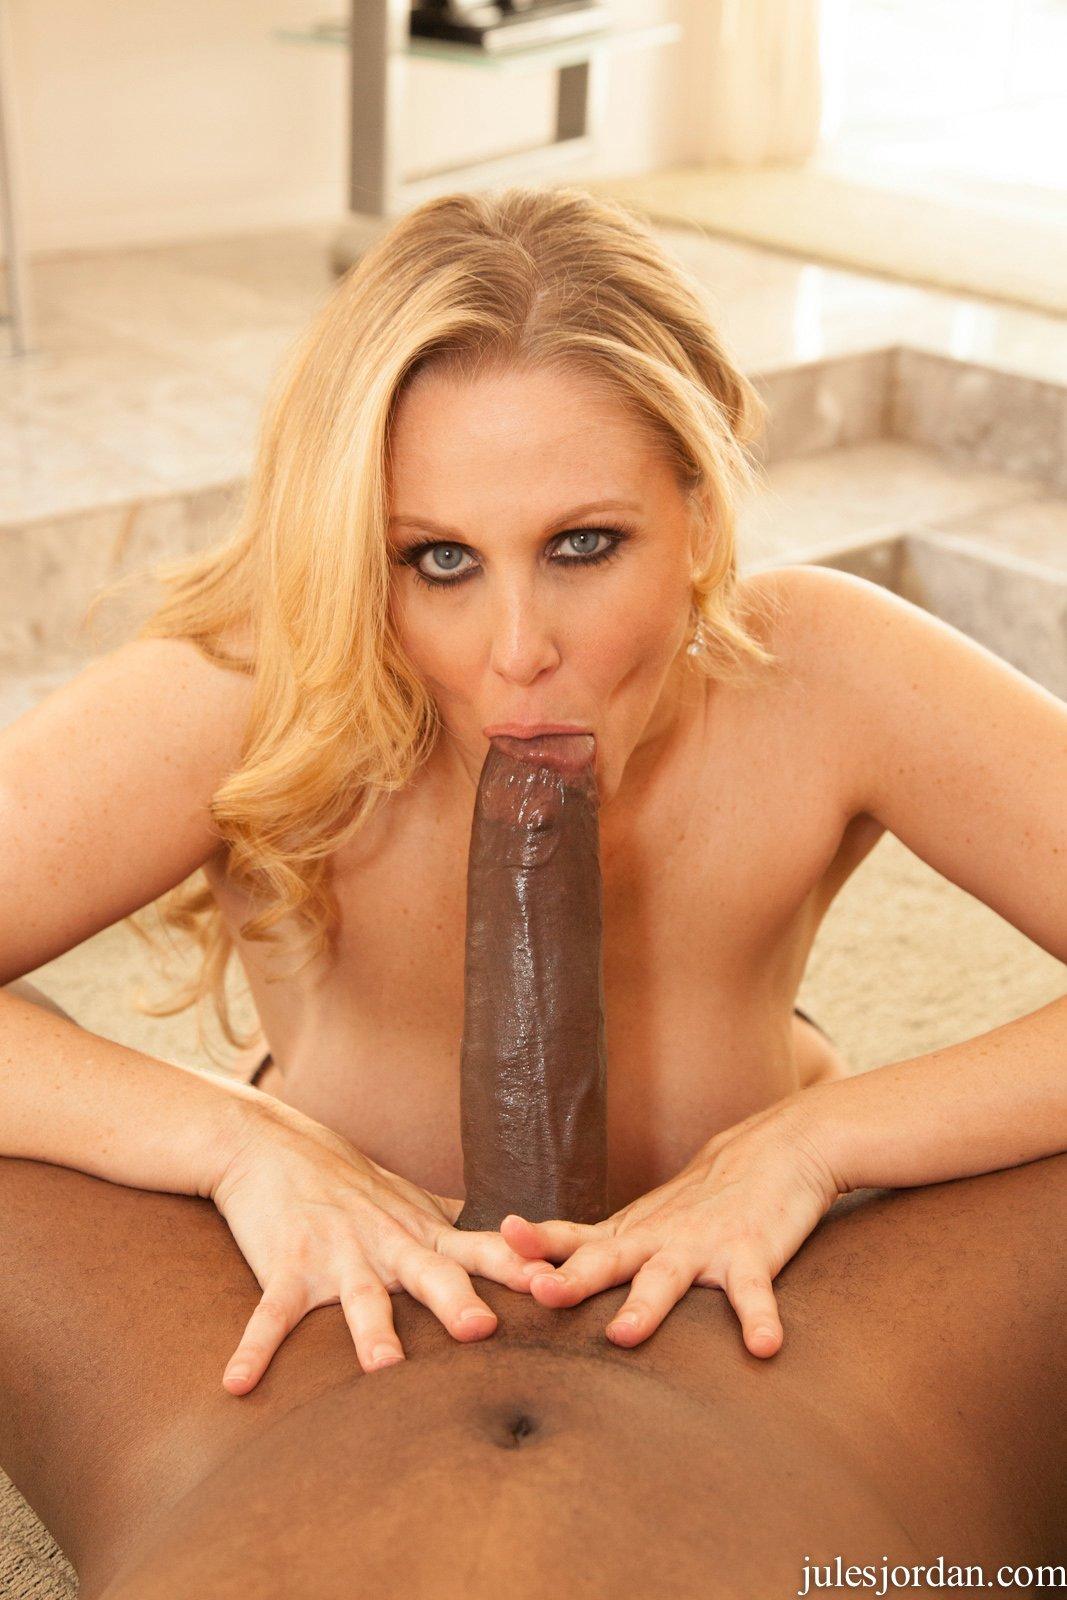 Amy schumer anal bondage electro shock porn - 2 part 2